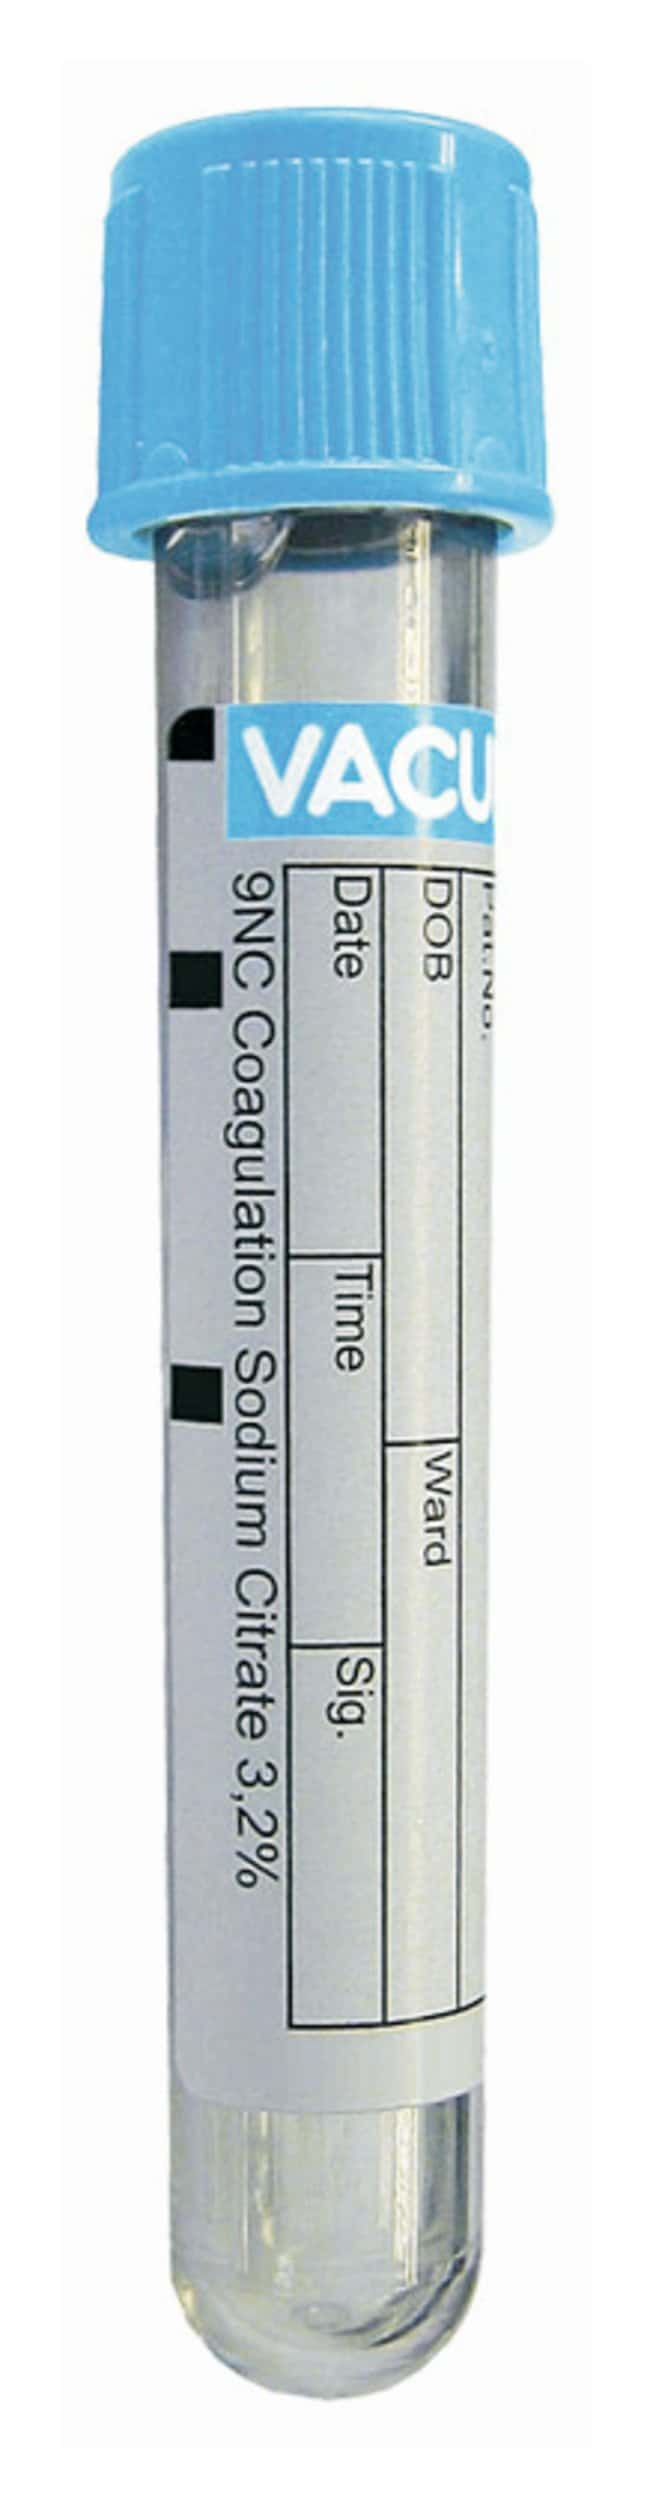 Greiner Bio-OneCoagulation Tubes with Sodium Citrate Solution